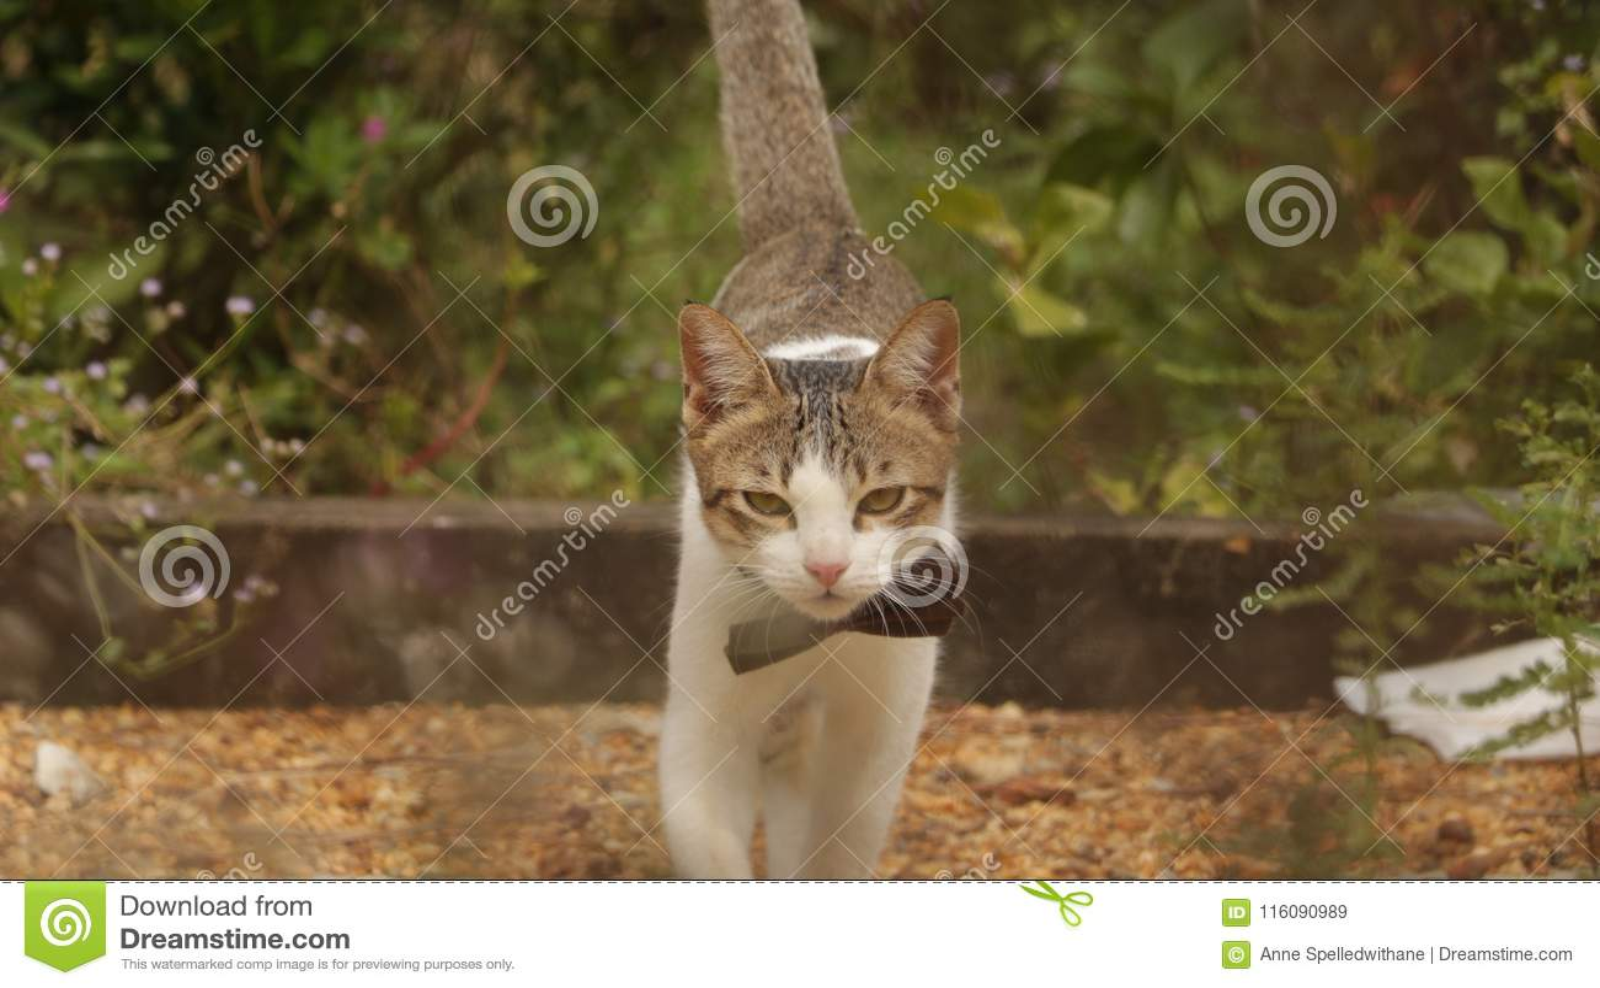 Kitten Walking in Tuin met Grote Boog